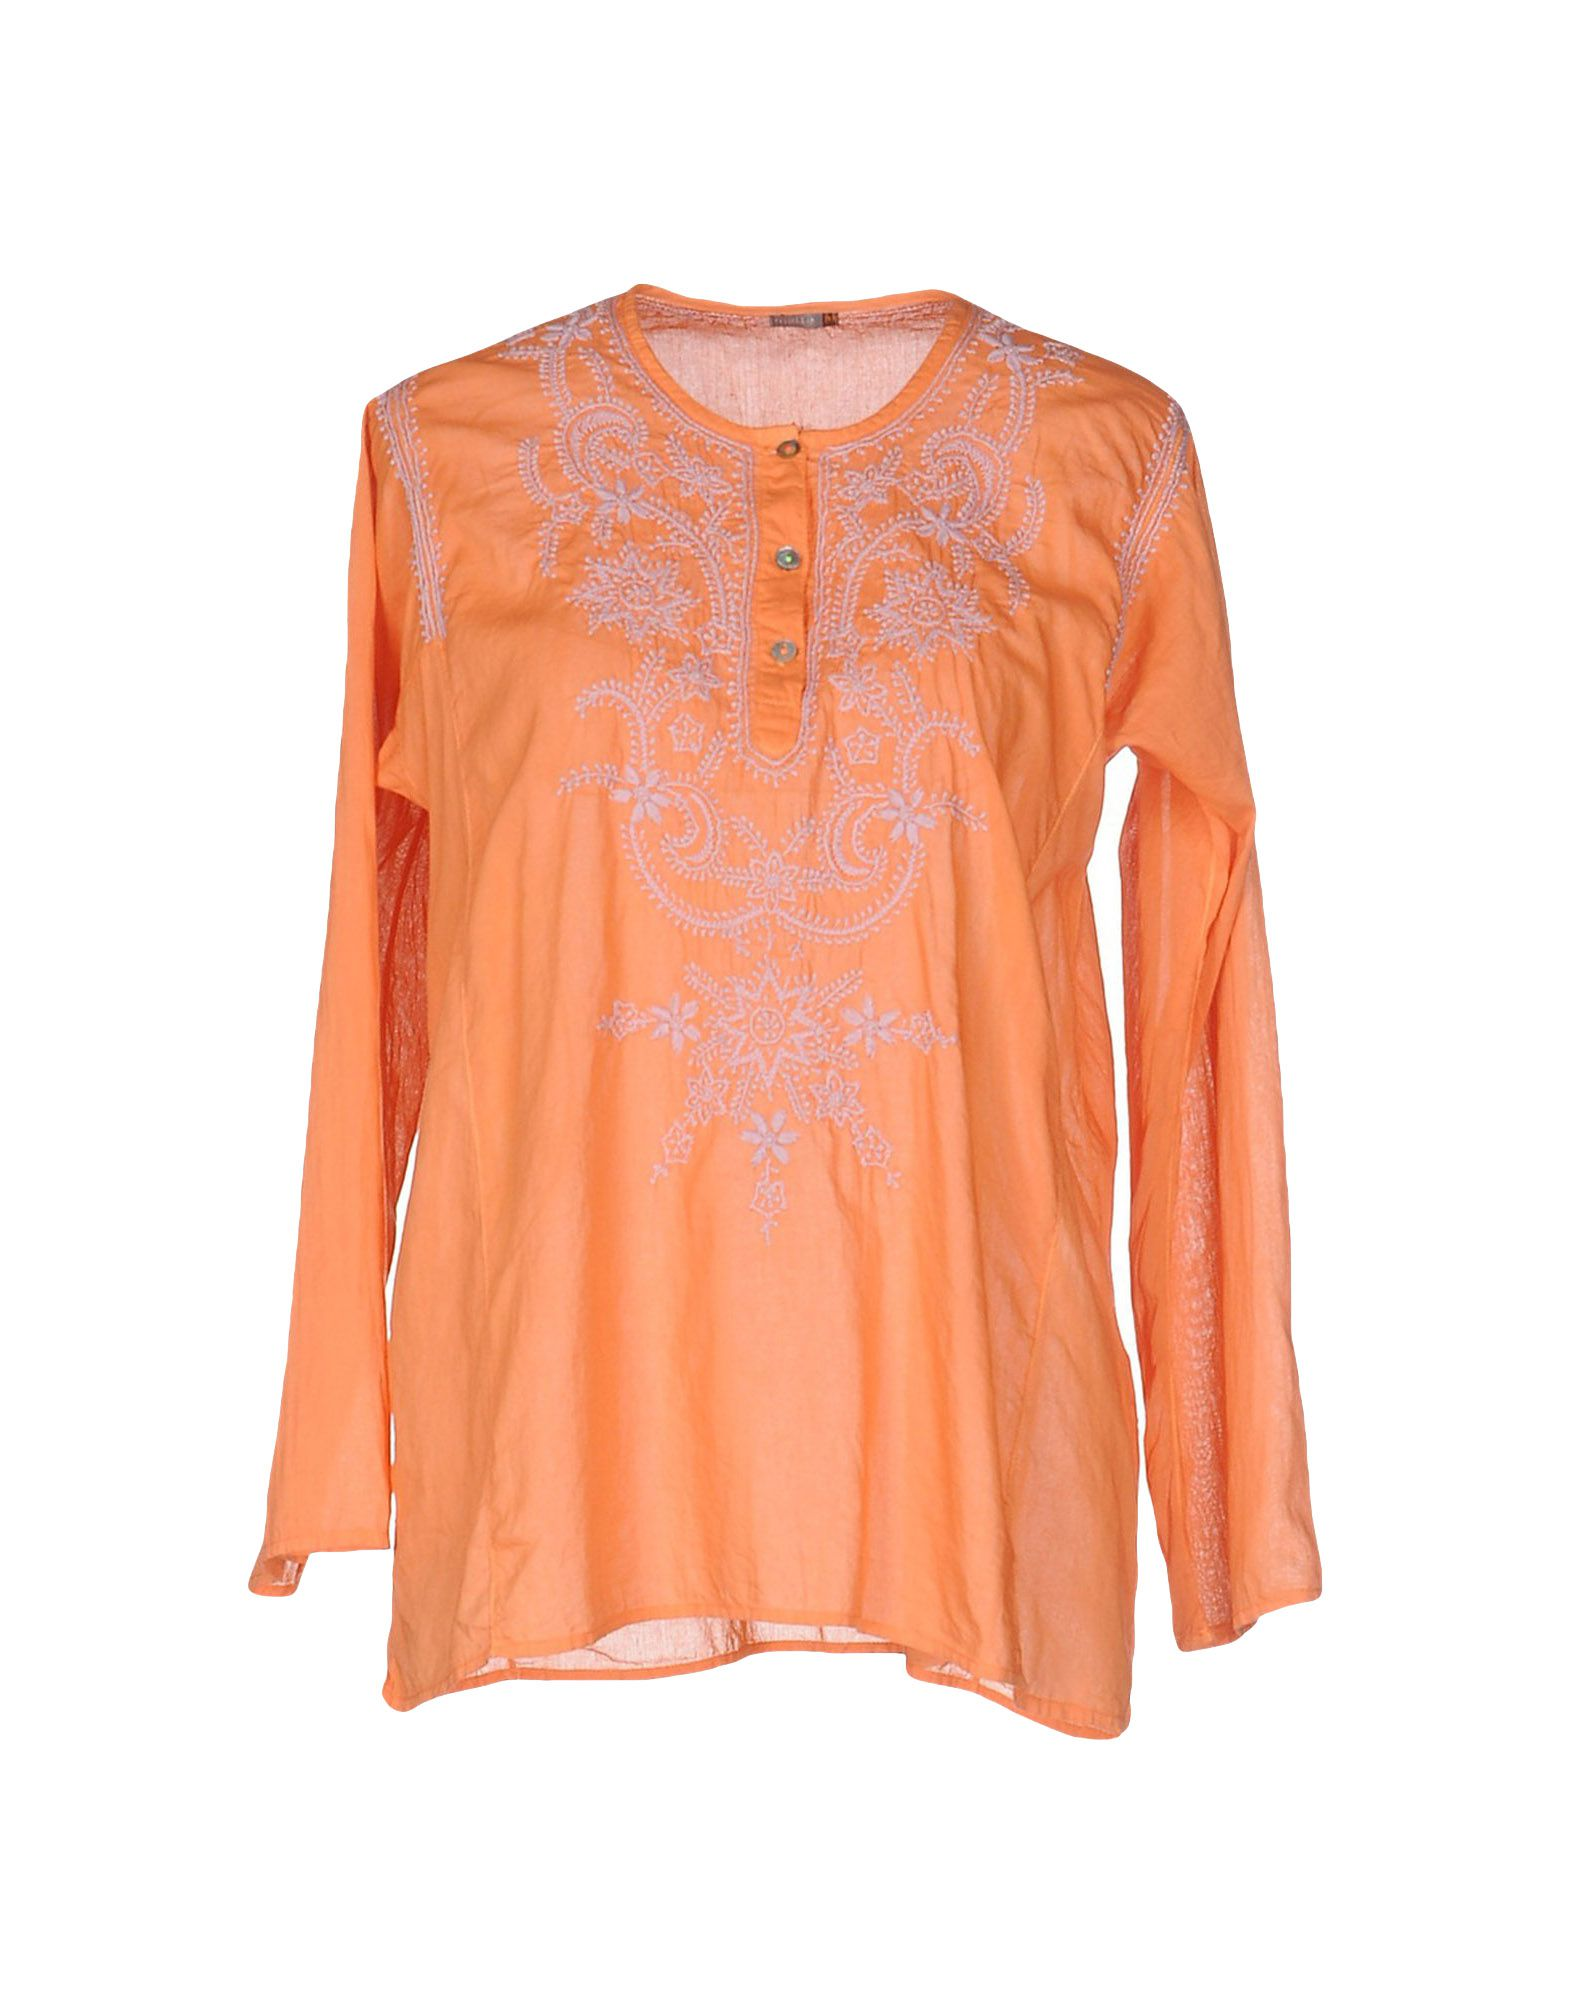 MATTA Blouse in Orange